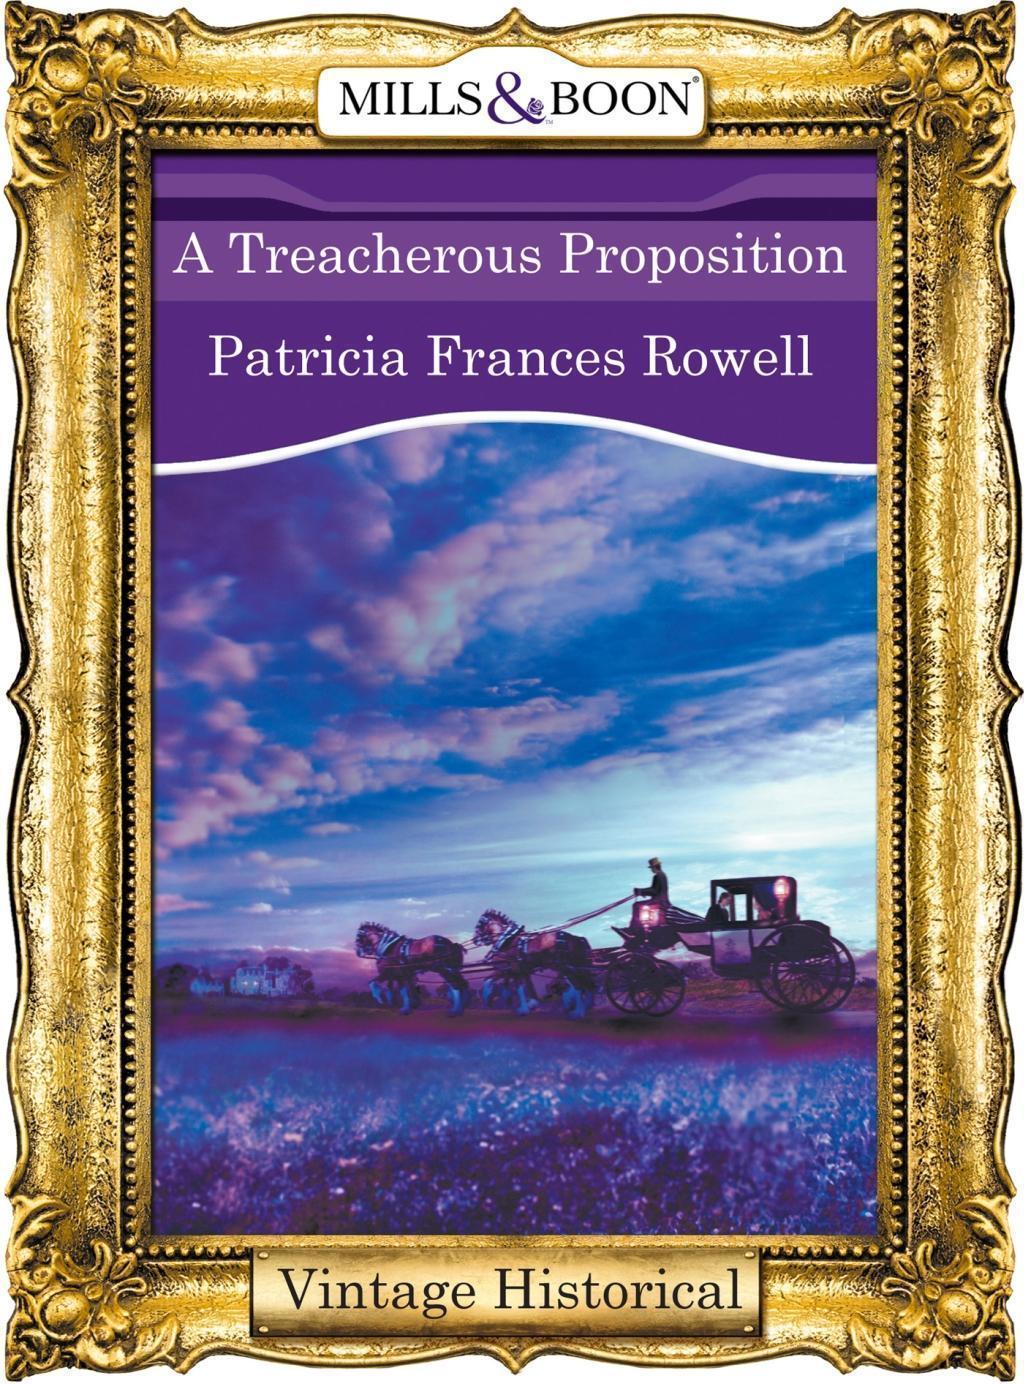 A Treacherous Proposition (Mills & Boon Historical)